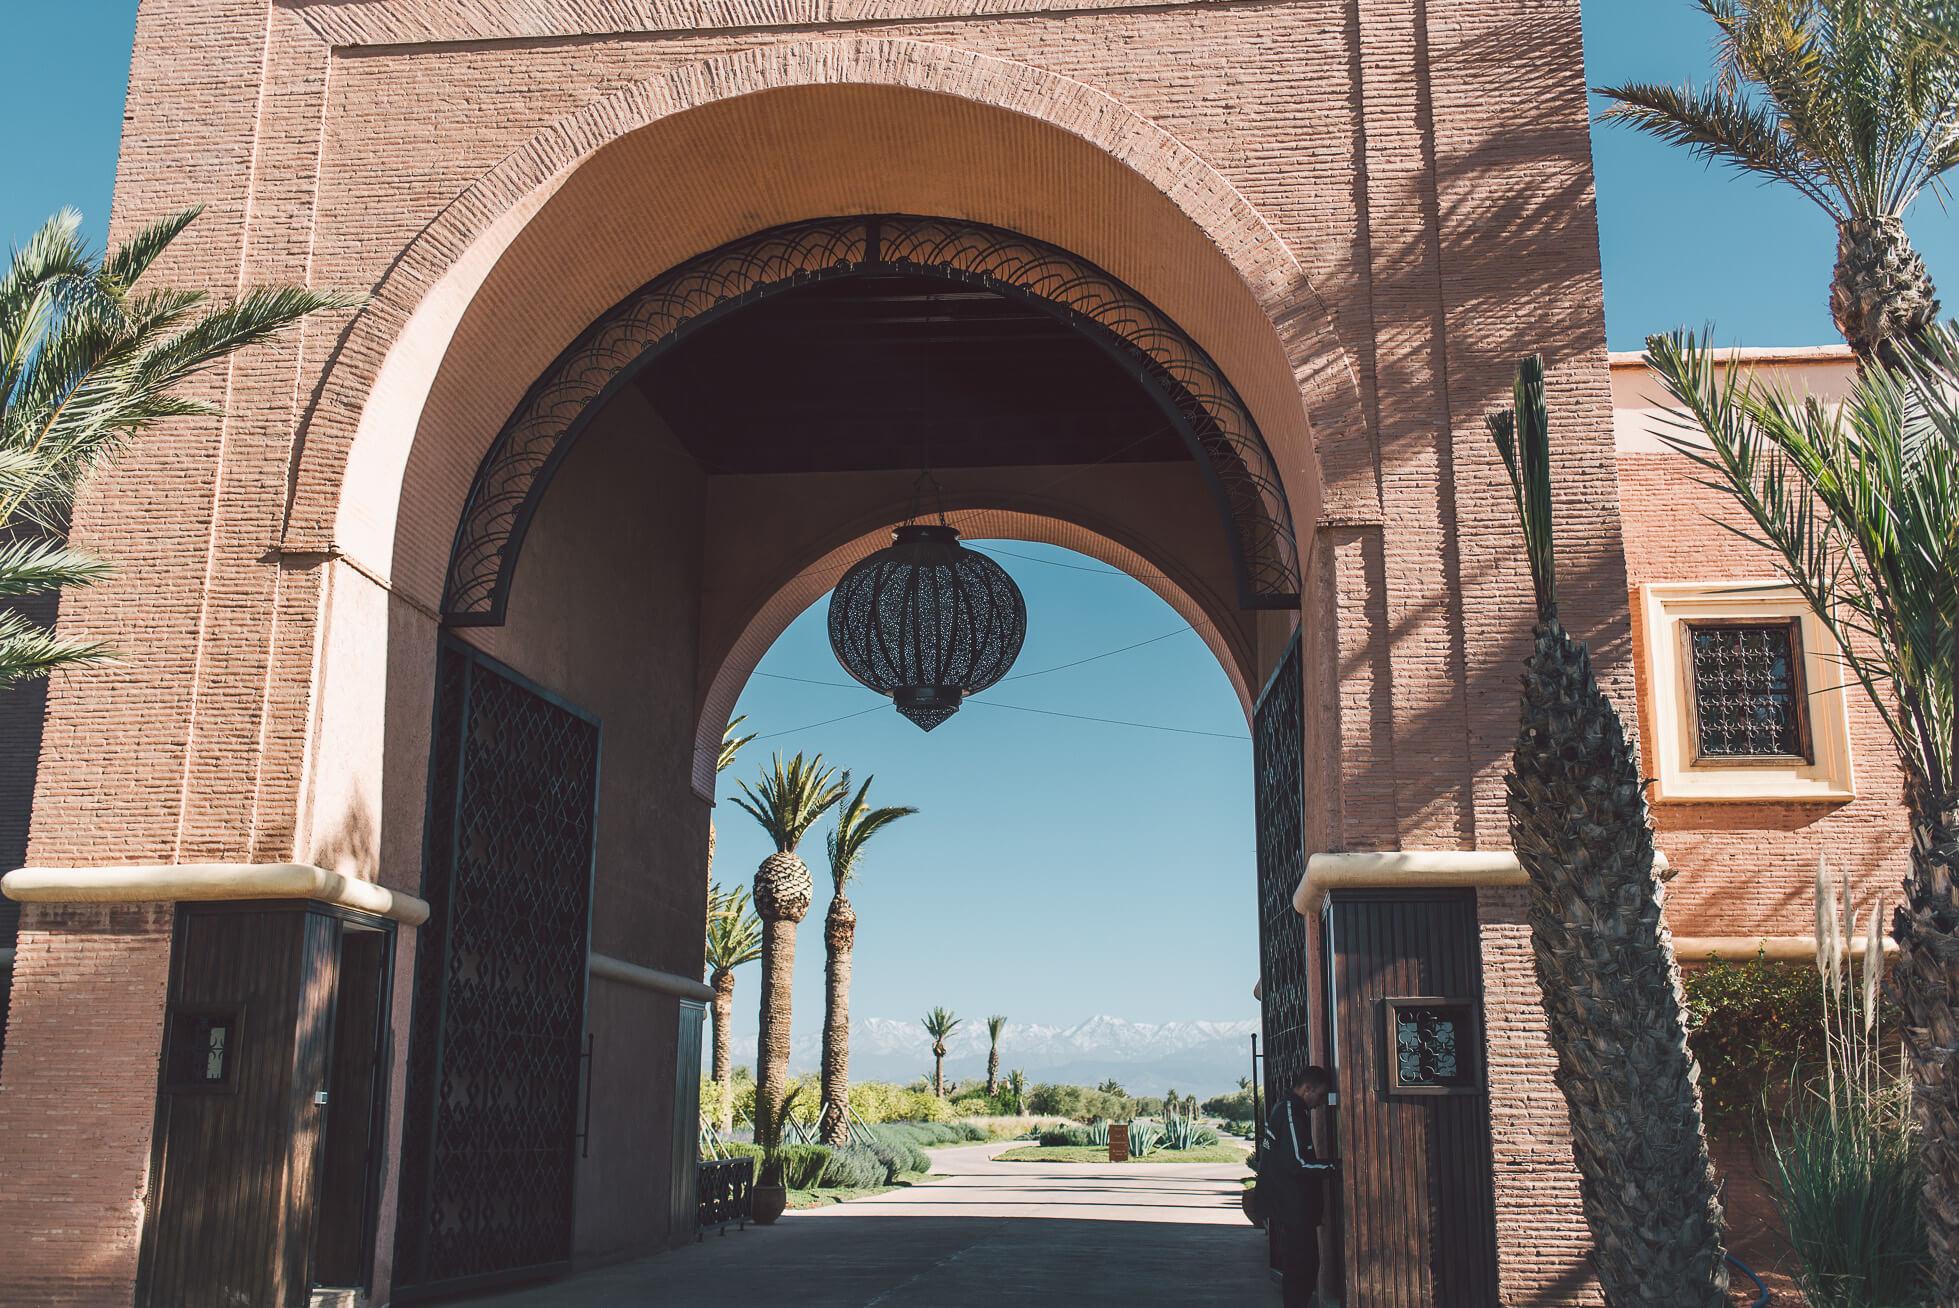 janni-deler-royal-palm-marrakechDSC_0572